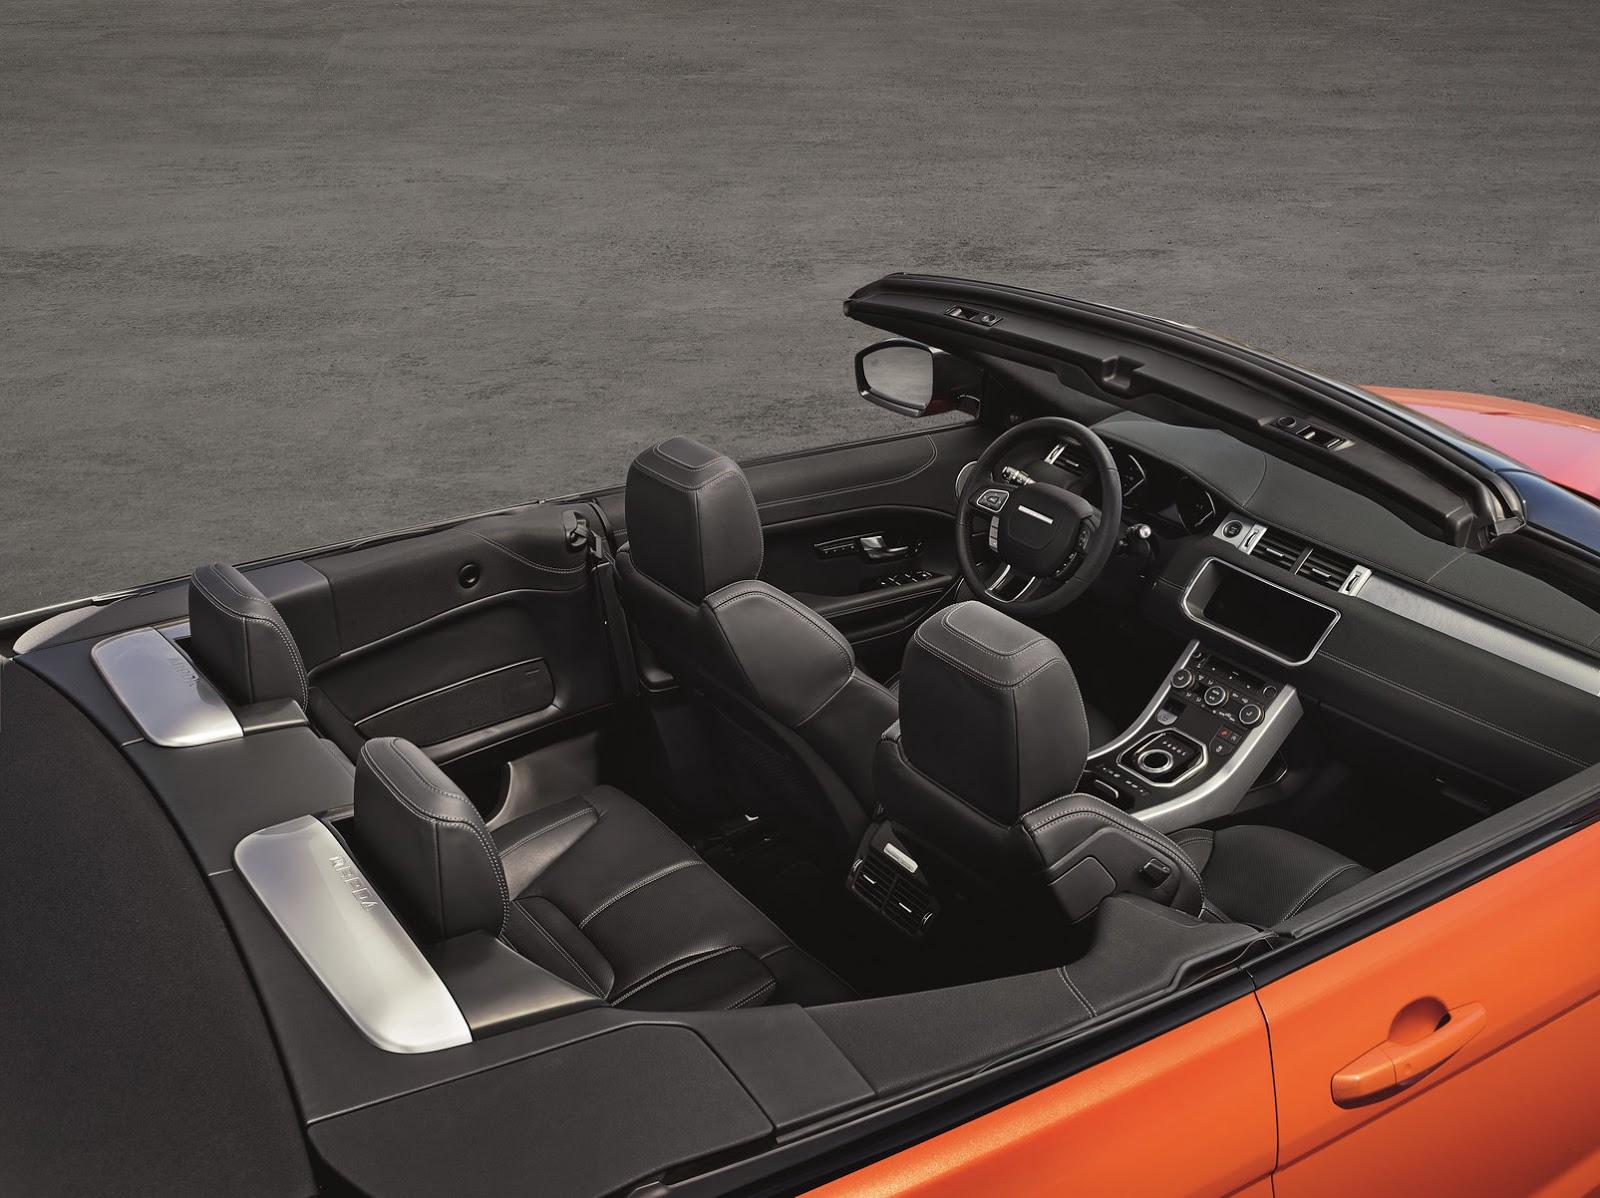 New-Range-Rover-Evoque-Convertible-14